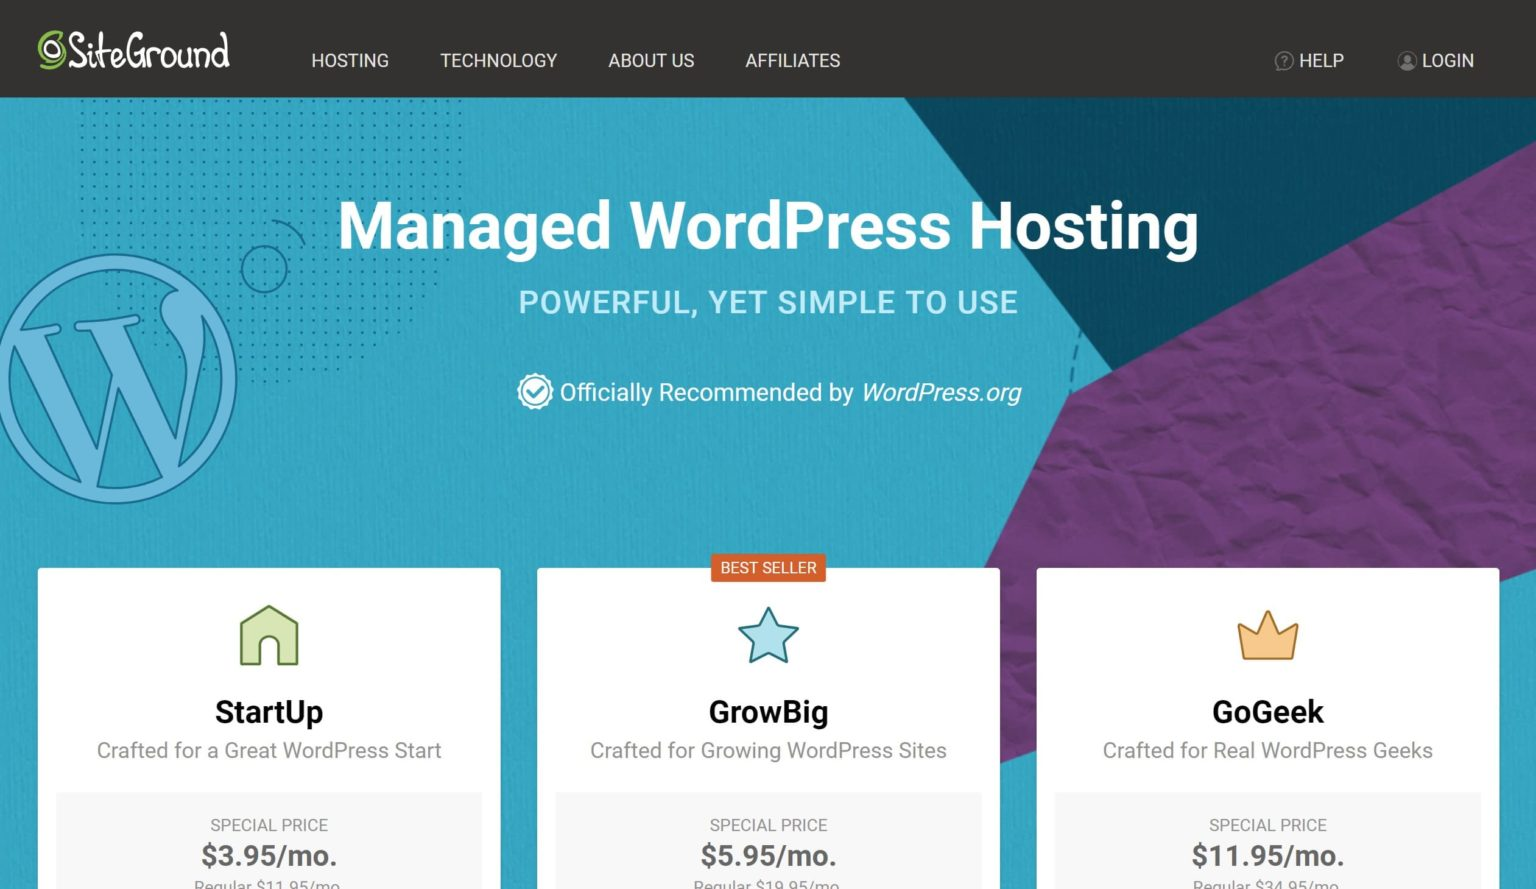 siteground is the fastest WordPress hosting provider